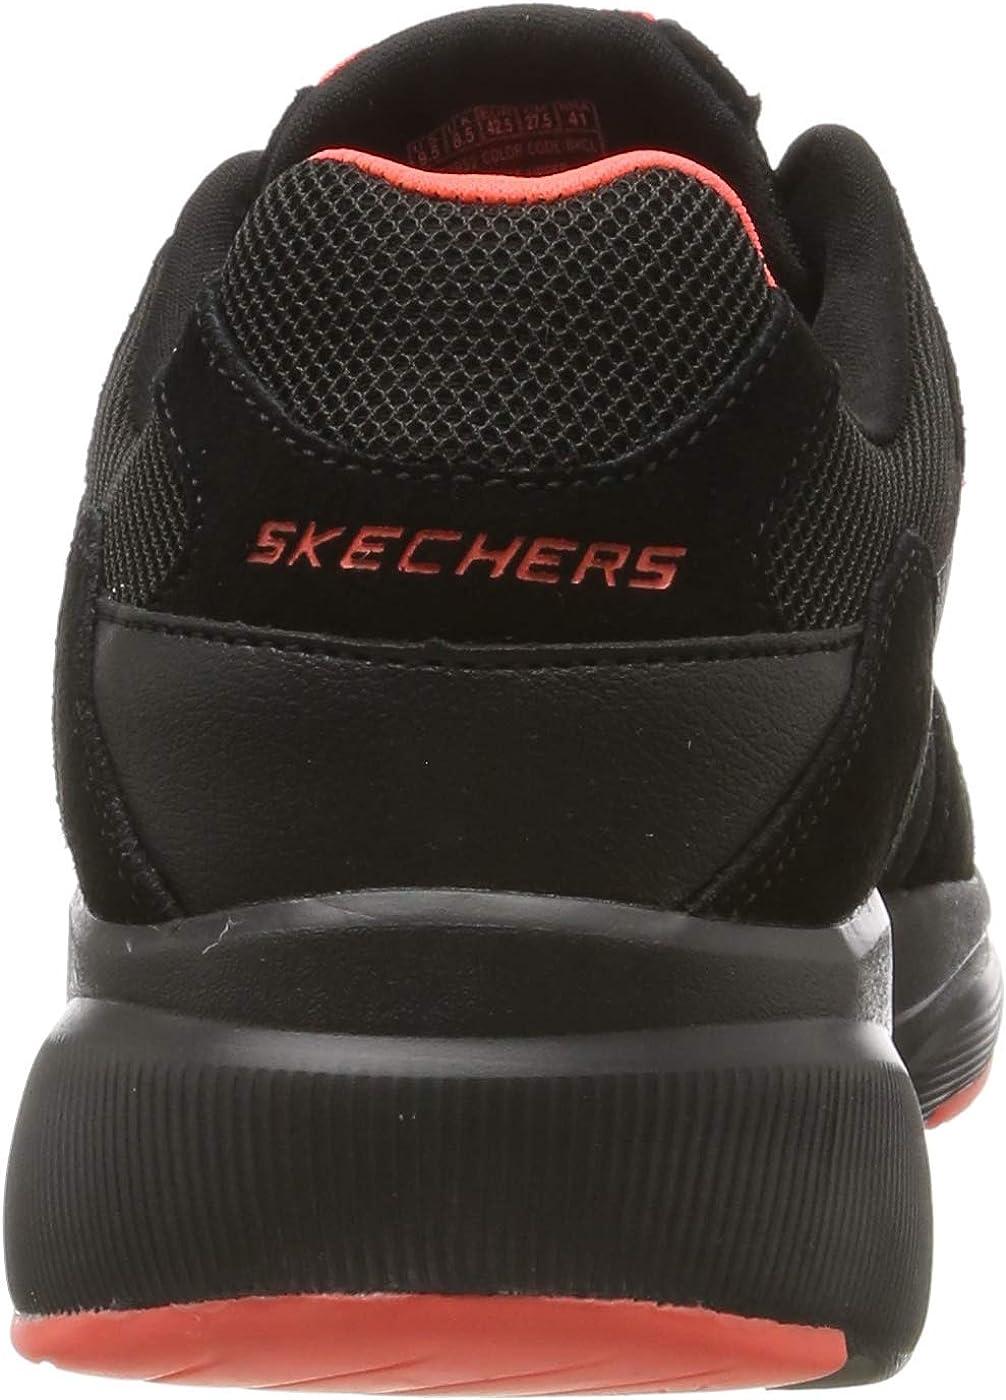 Skechers Meridian-Ostwall, Zapatillas para Hombre Negro Black Suede Mesh Pu Coral Trim Bkcl